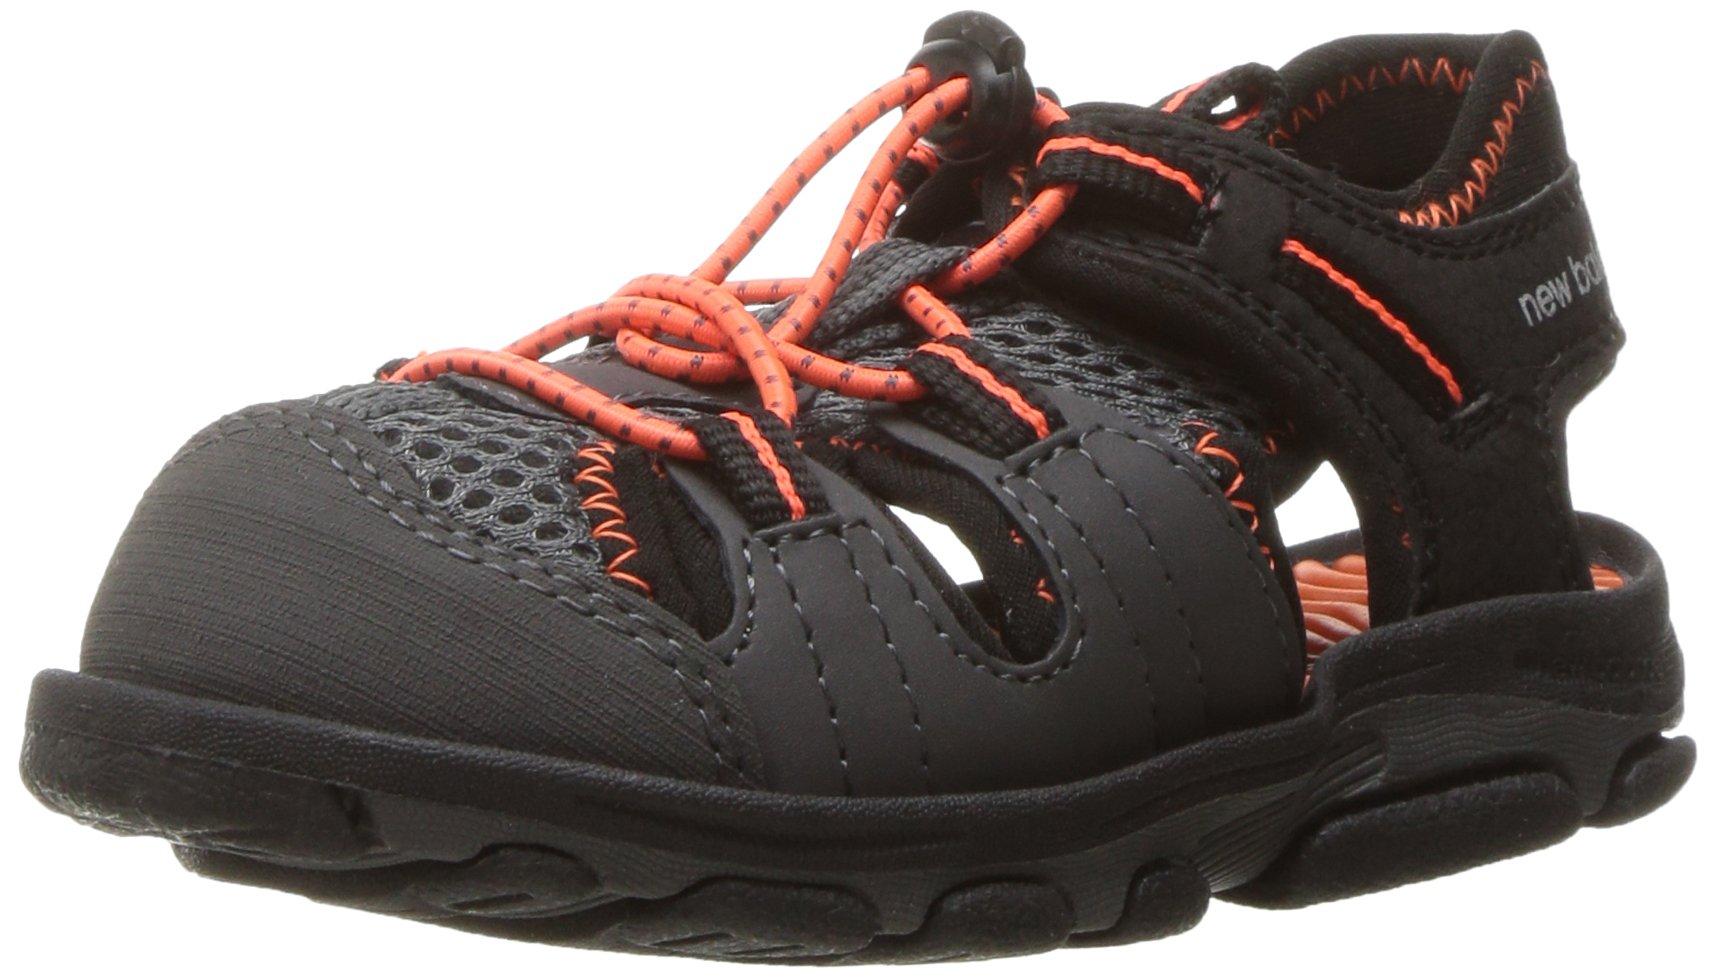 new products how to serch Sales promotion New Balance Boys' Kids Adirondack Sandal Fisherman, Black/Orange, 8 W US  Toddler